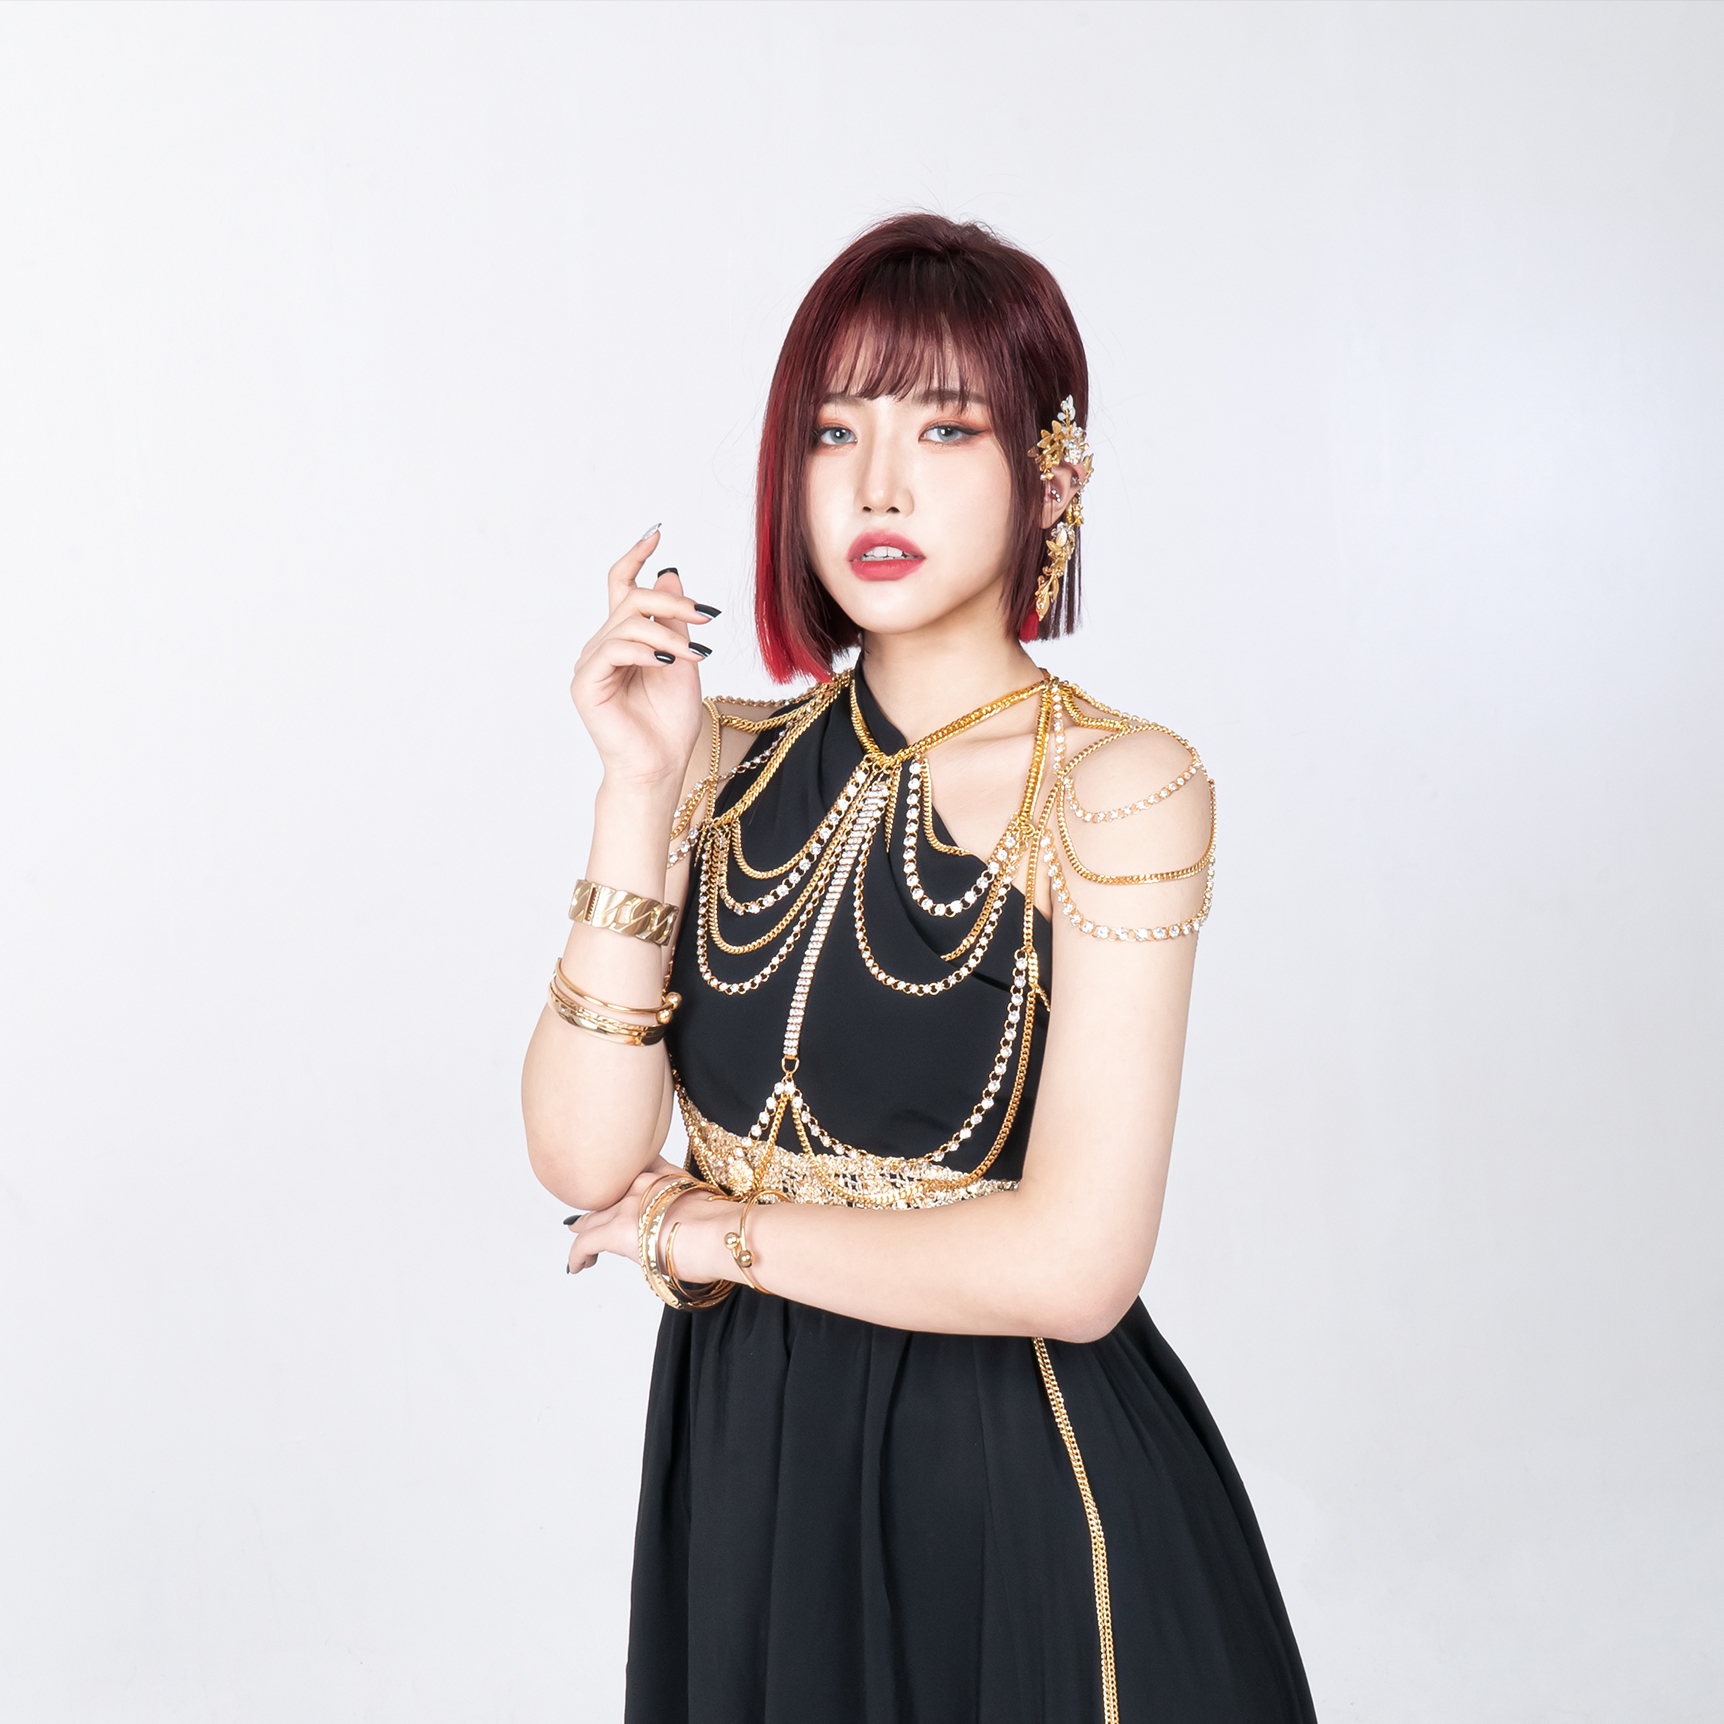 SWAN profile image